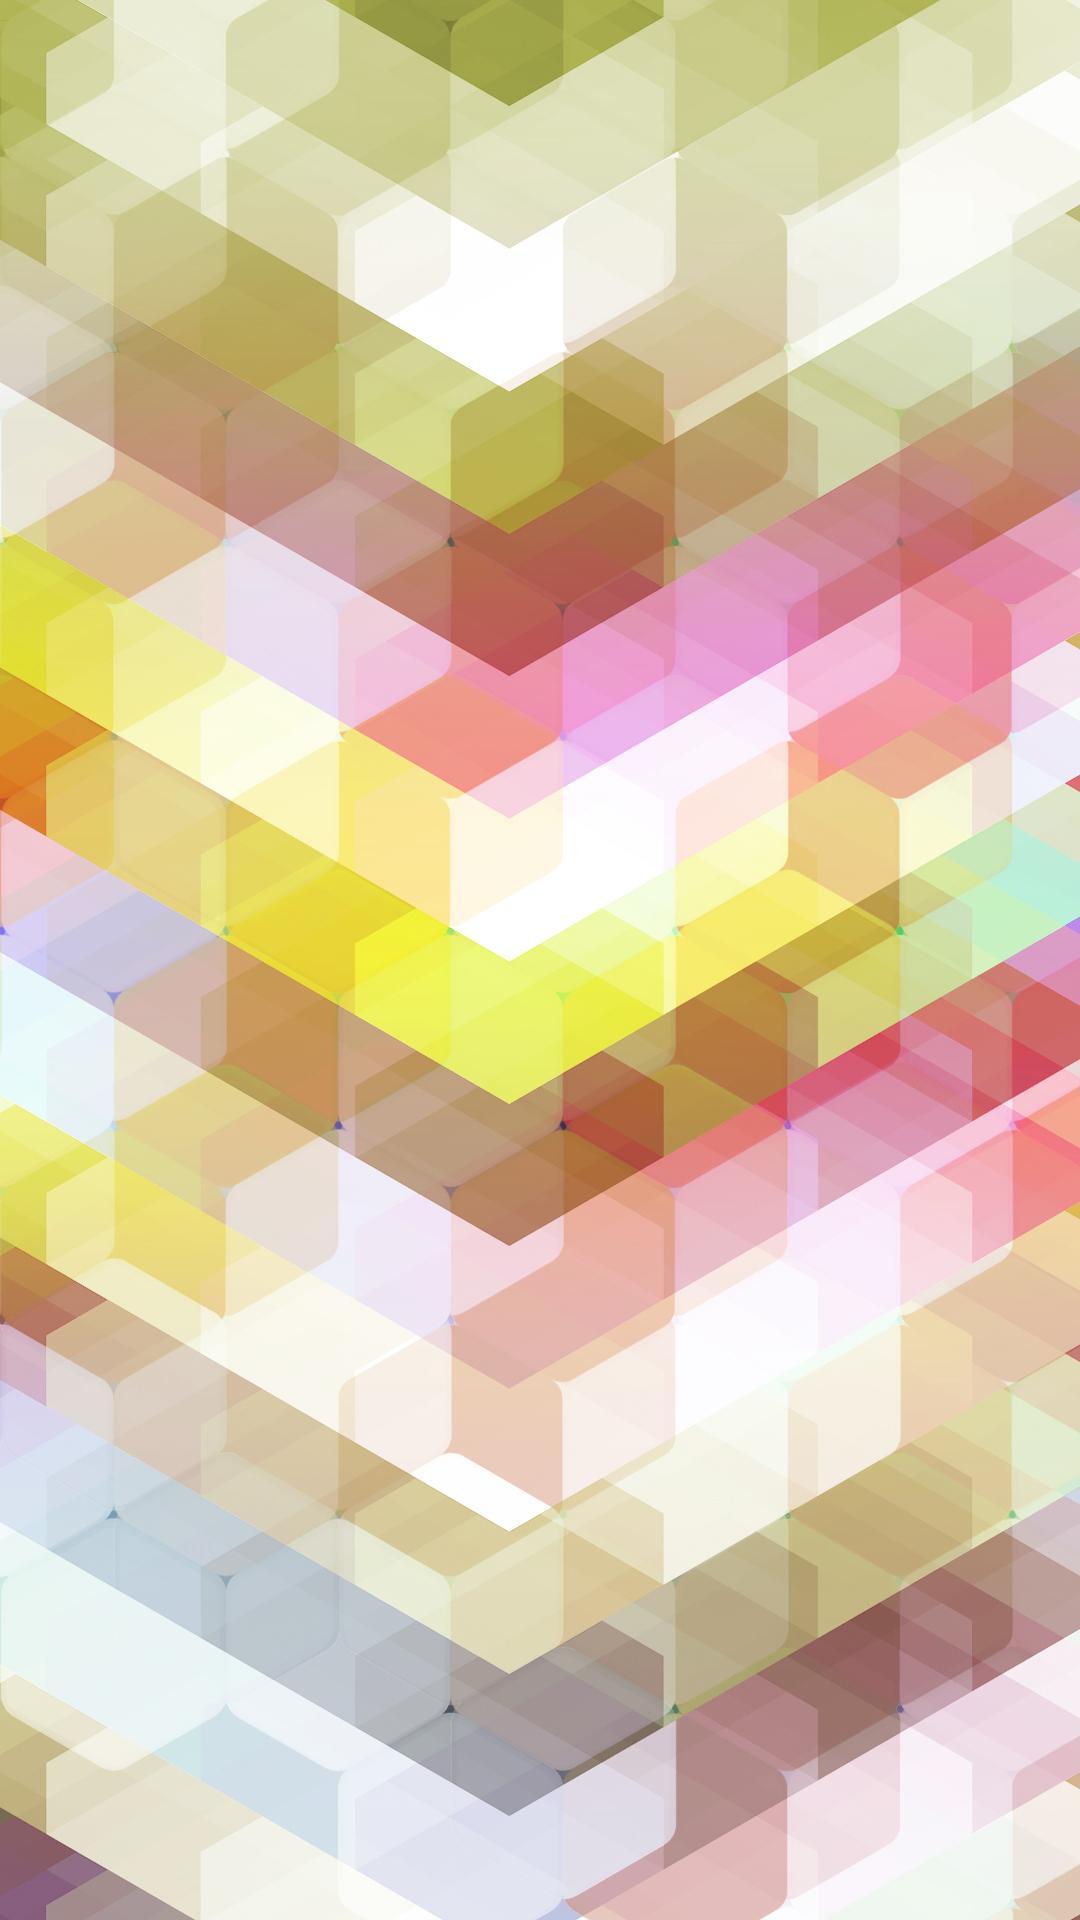 48+ Free Live Wallpapers for LG on WallpaperSafari